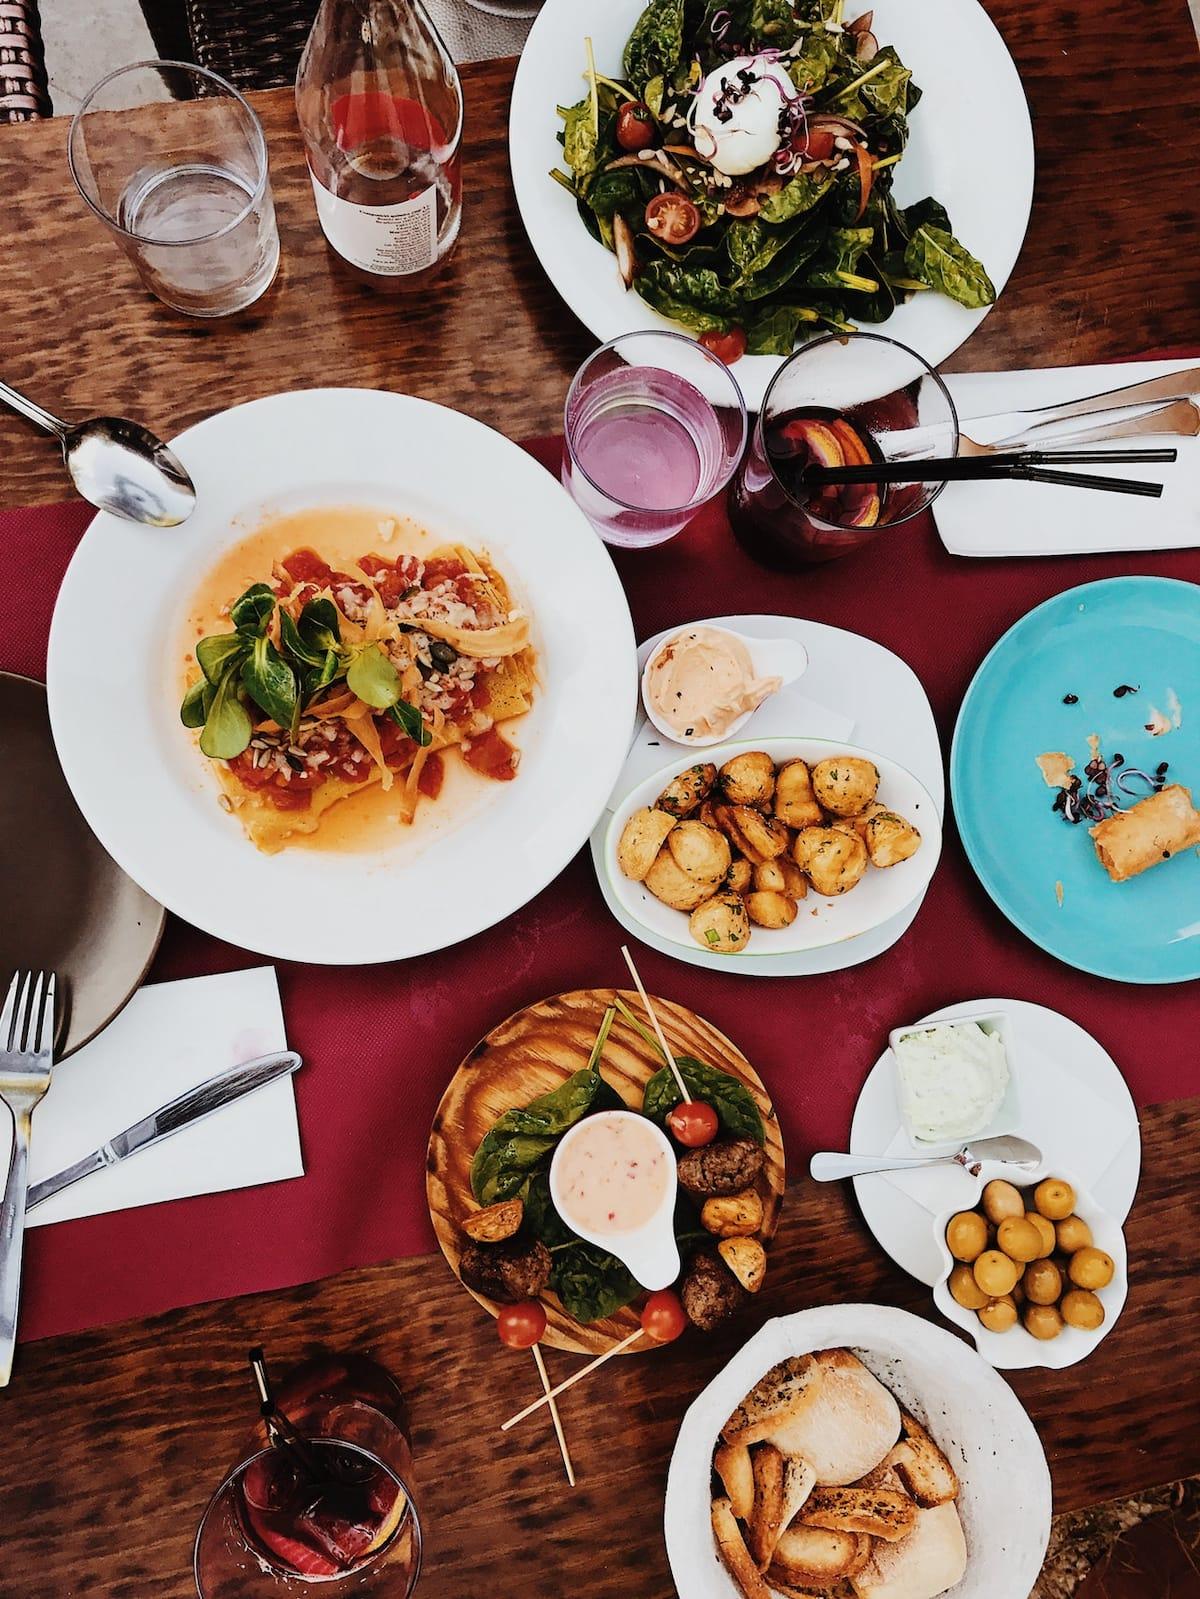 Culinary Arts courses and schools in Kenya ▷ Tuko co ke